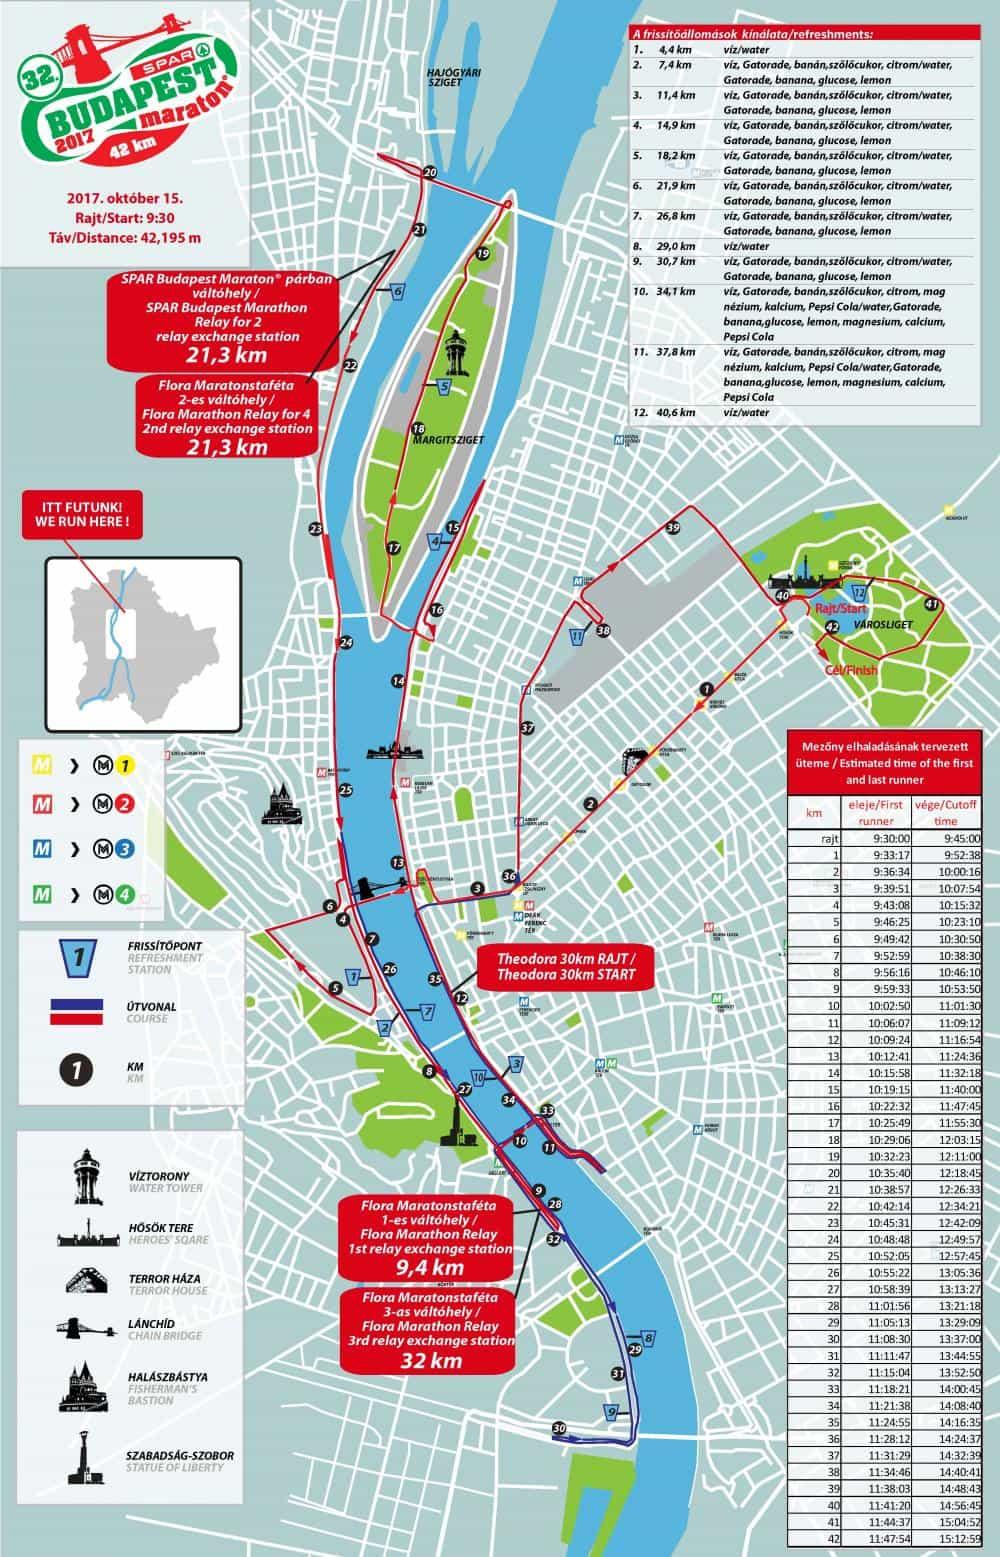 térkép budapest útvonal A 32. SPAR Budapest Maraton útvonala (térkép, animáció  térkép budapest útvonal